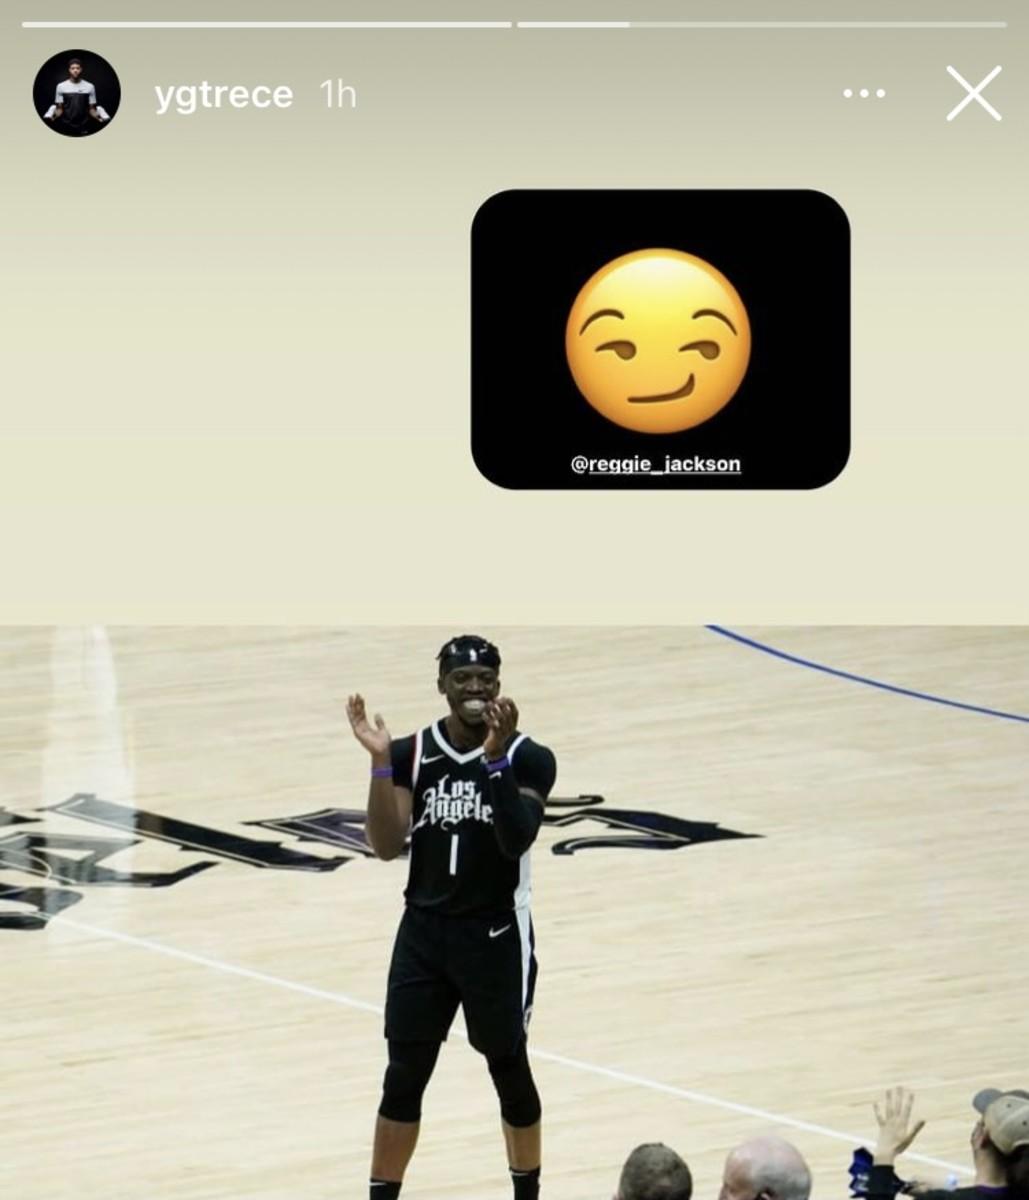 Via @ygtrece on Instagram